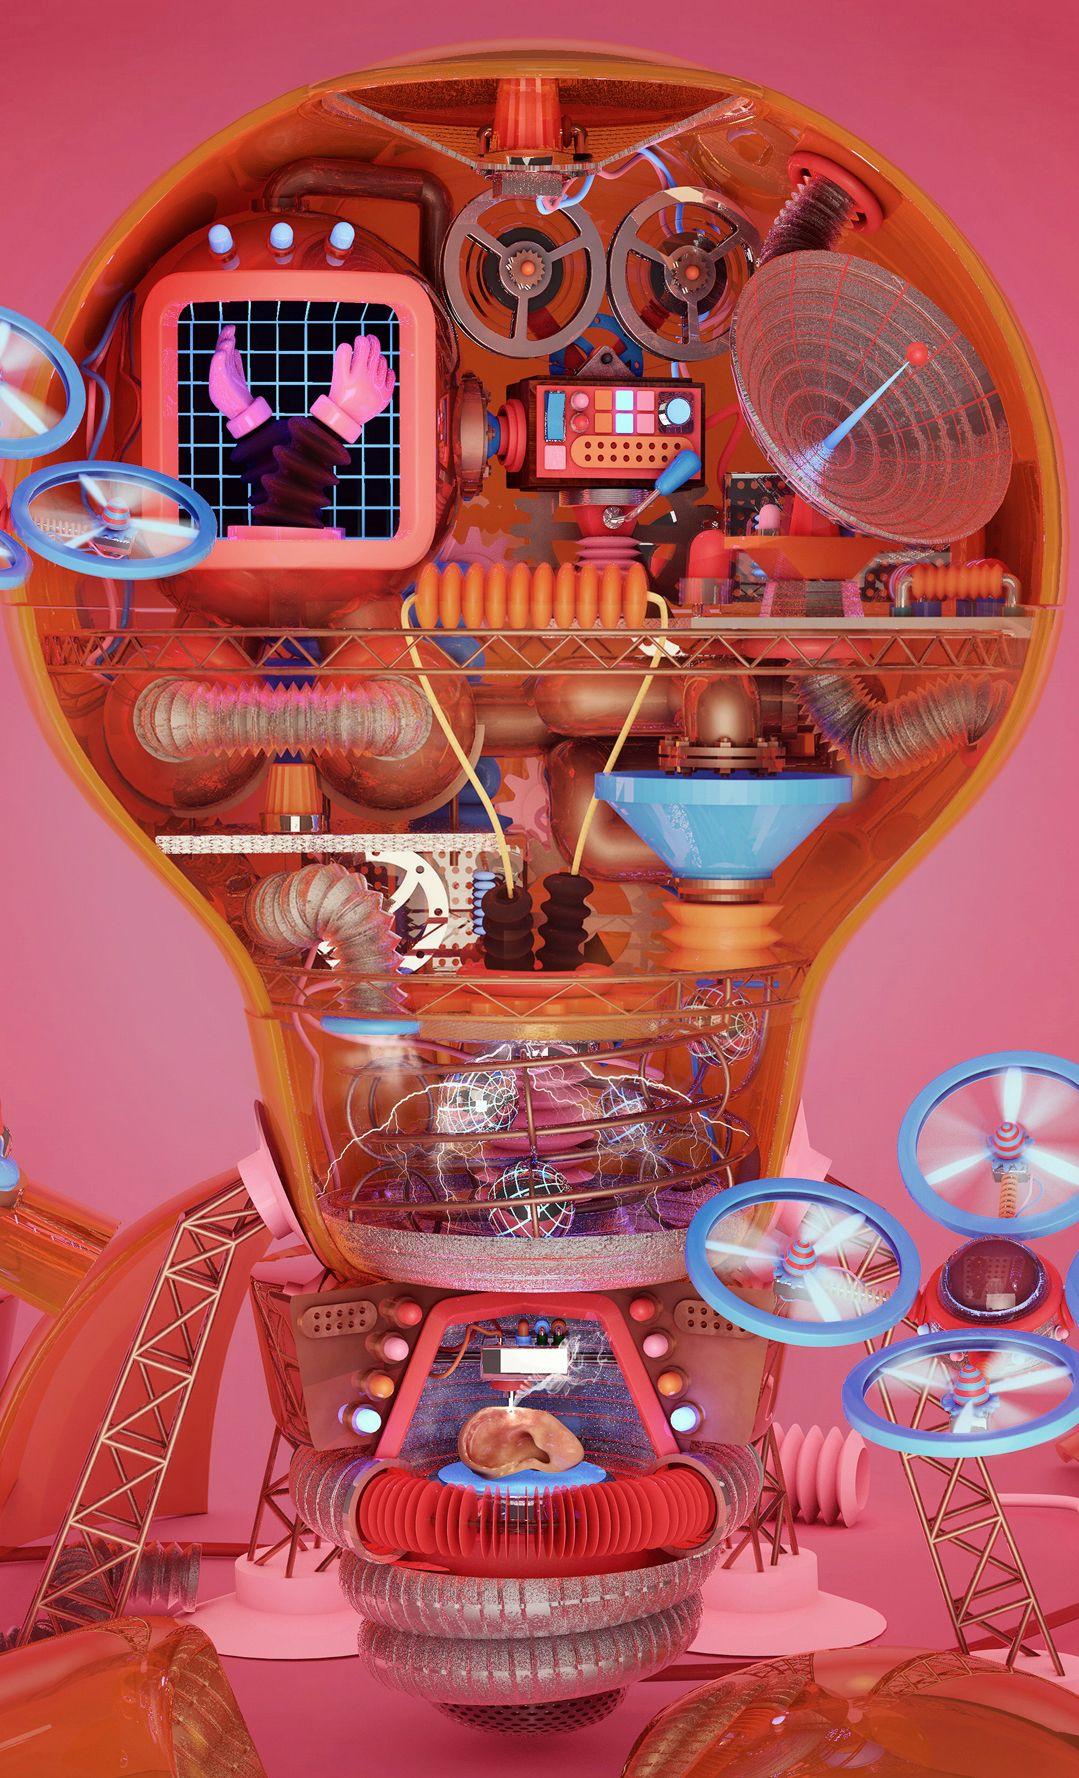 Computer arts cover on behance computer art creative